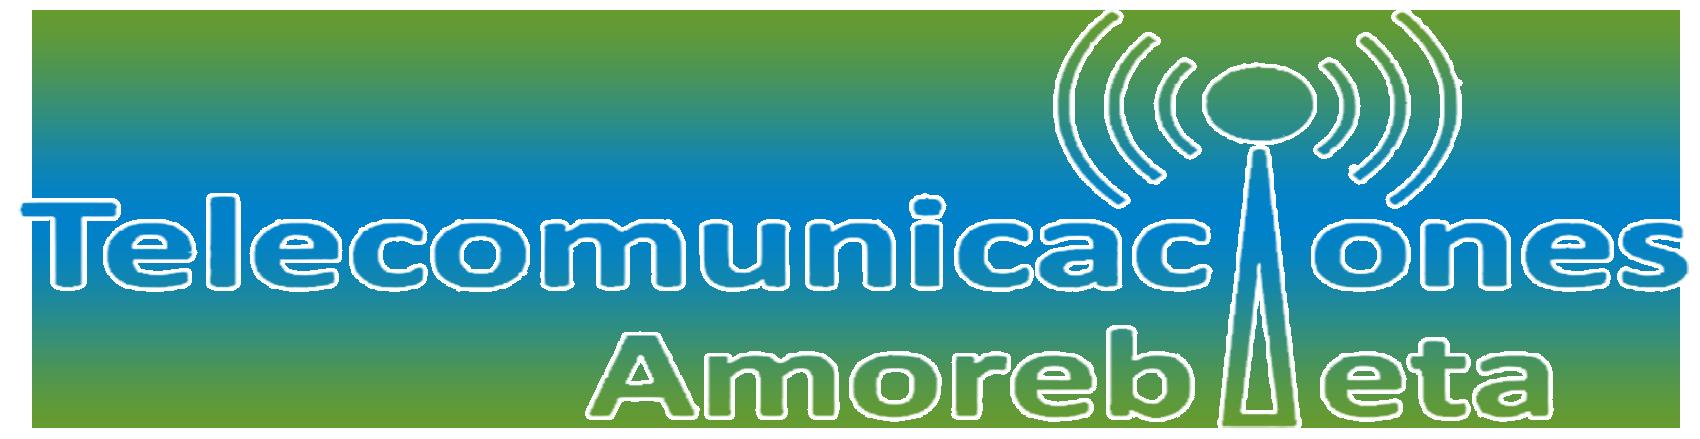 Telecomunicaciones Amorebieta